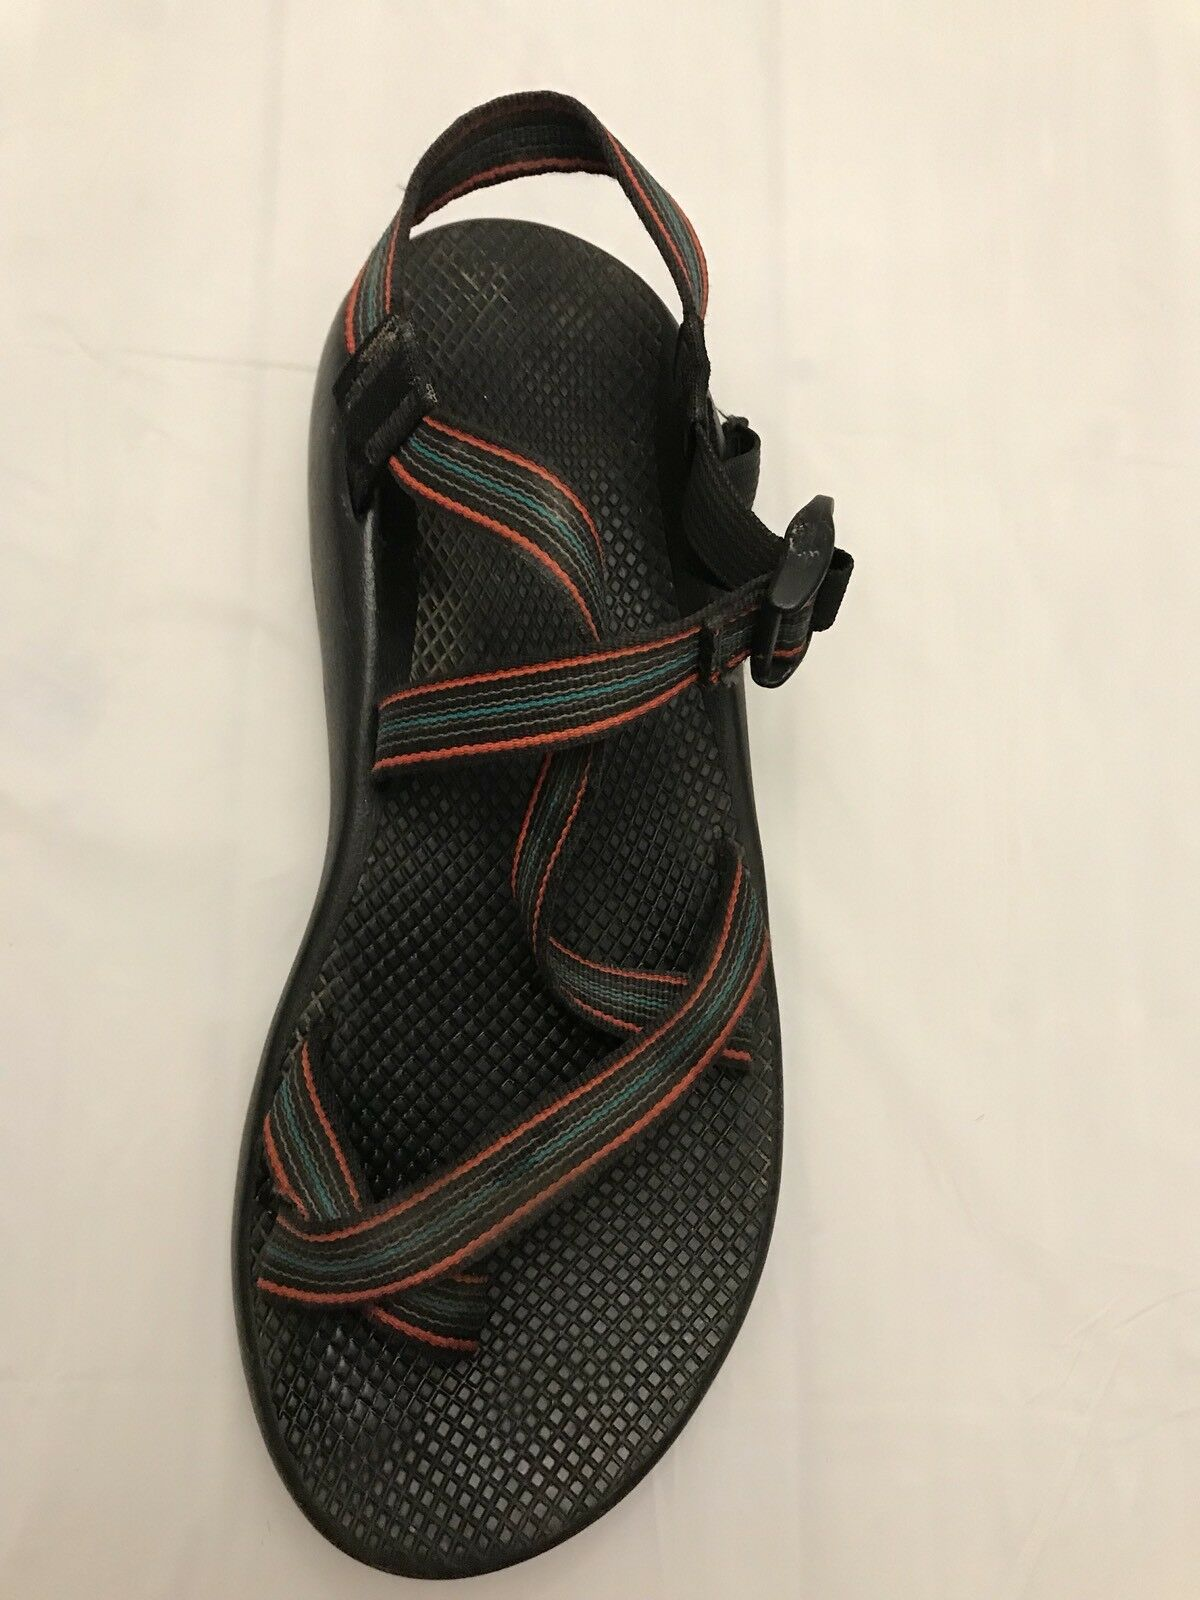 Mens Size 13 CHACO CLASSIC  Sport Sandals Slides Vibram Sole